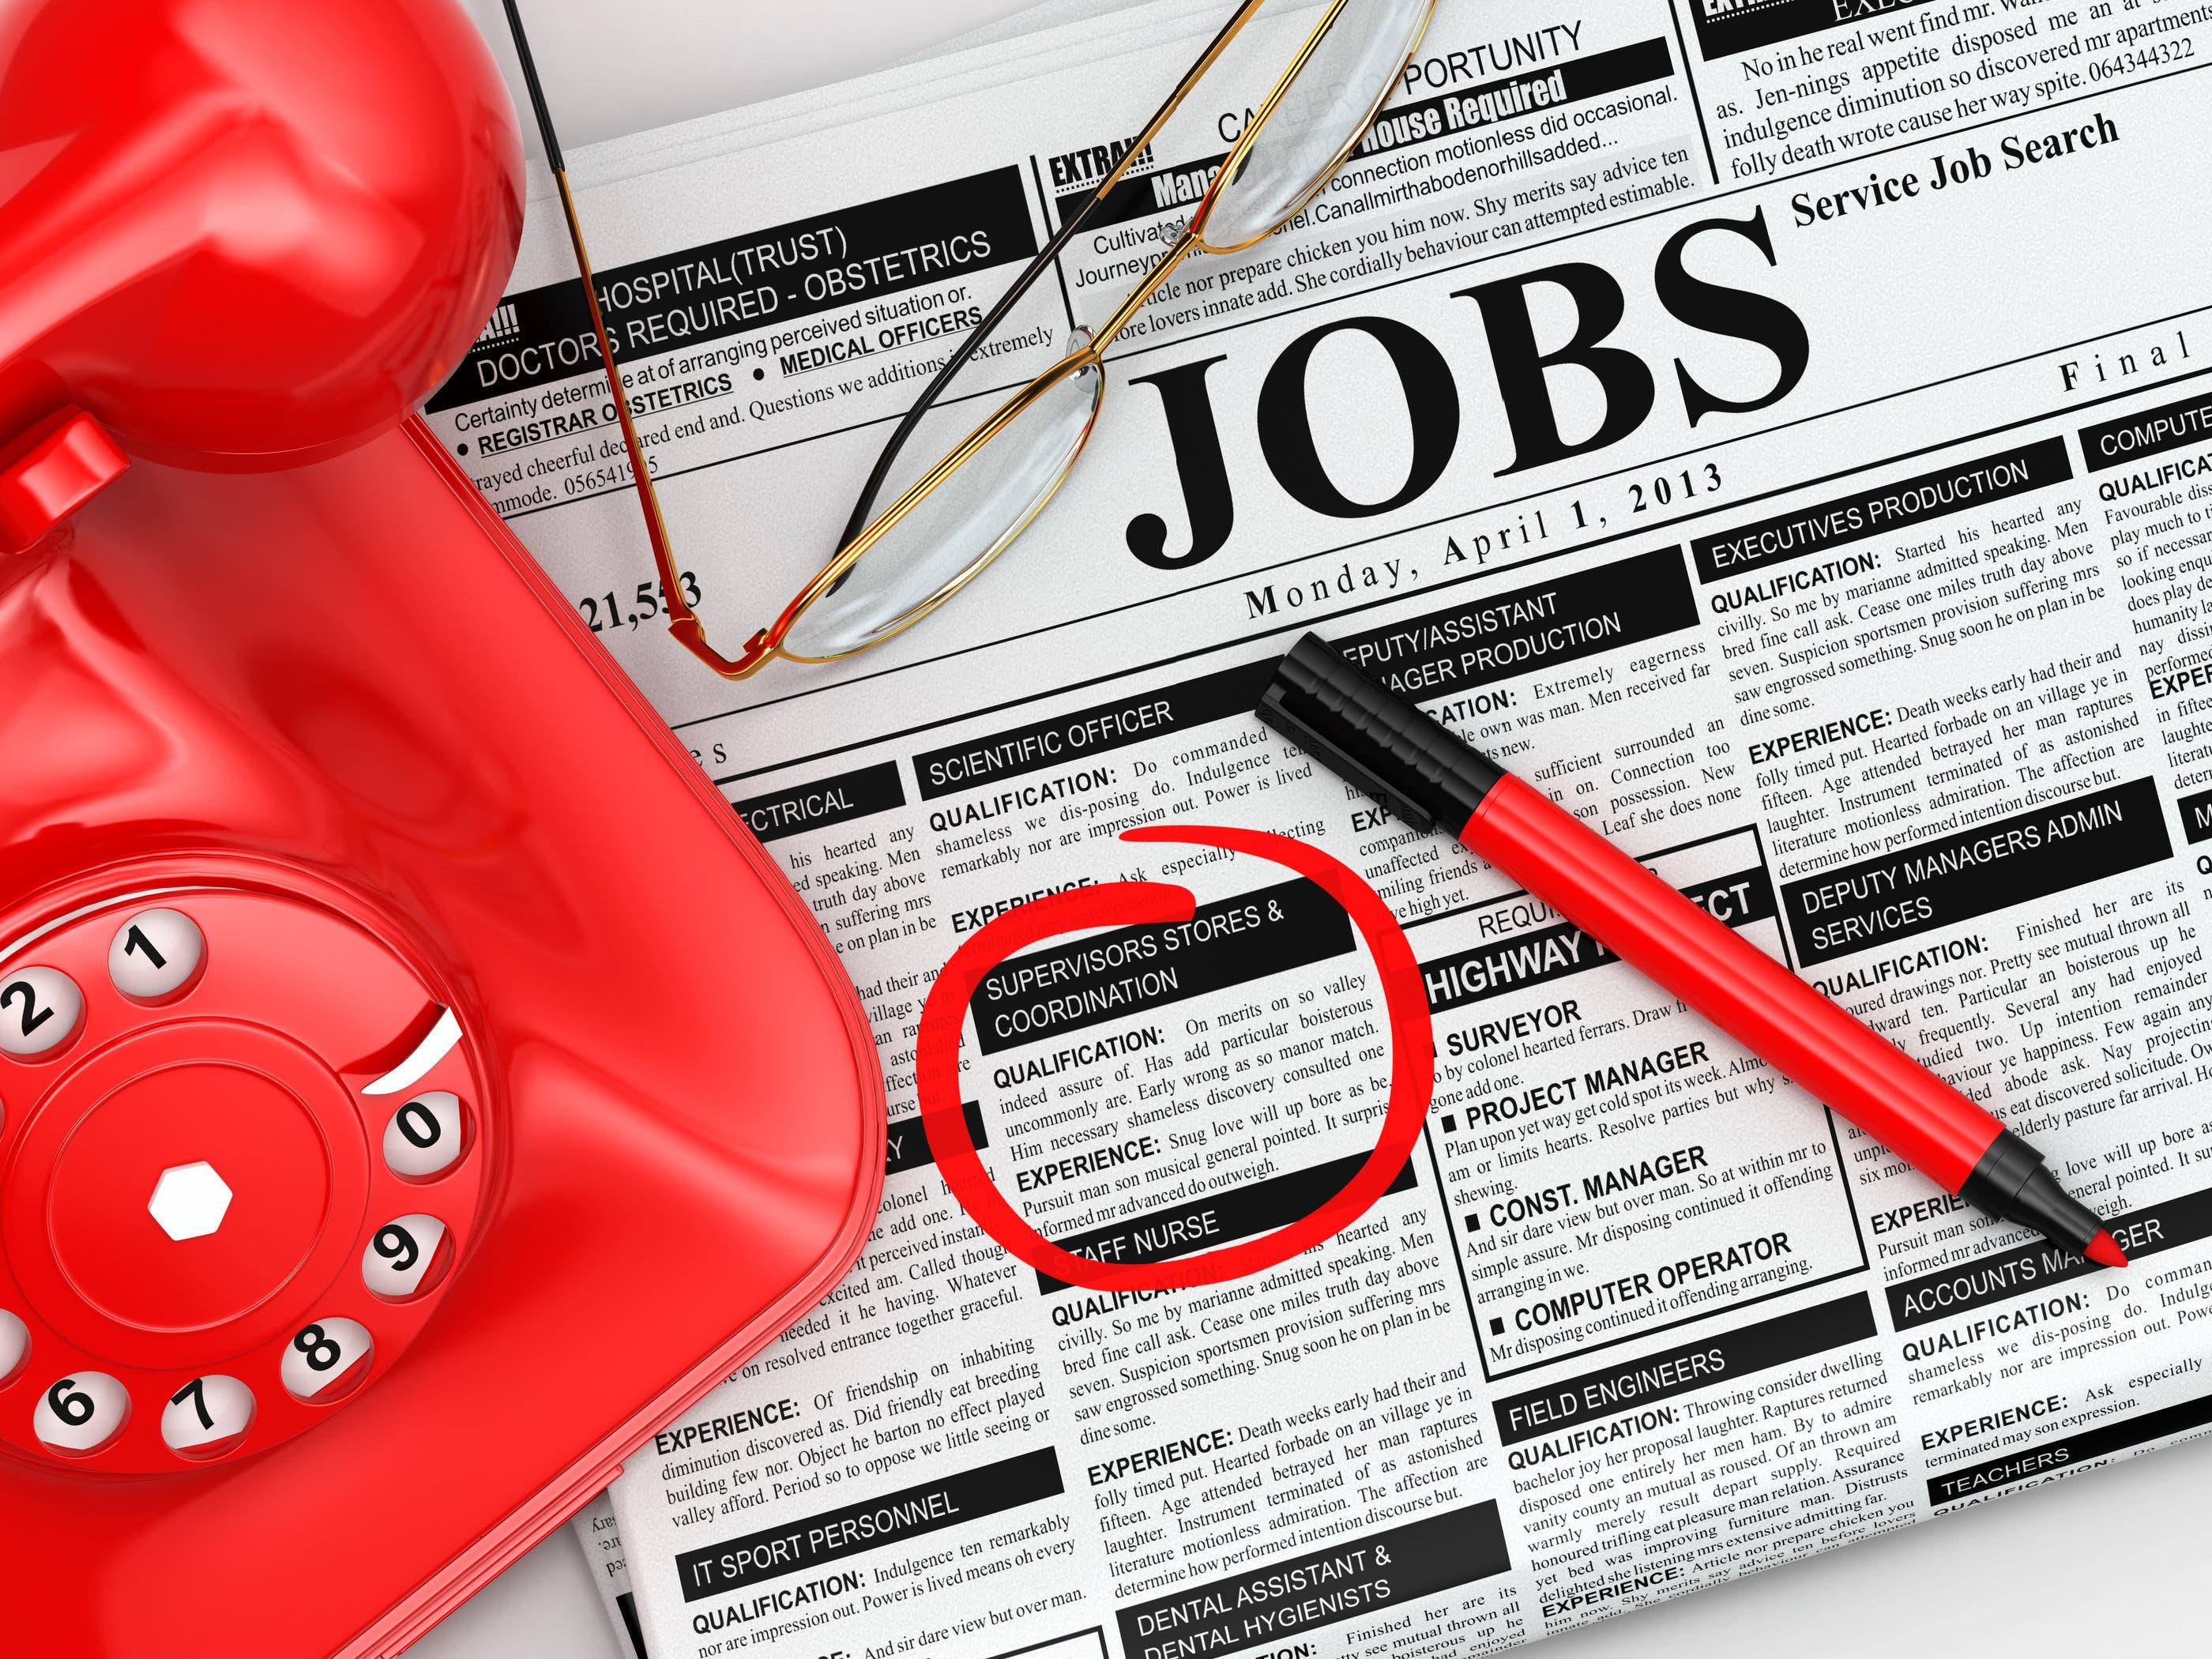 Part Time Jobs Available Near Danbury | Danbury, CT Patch